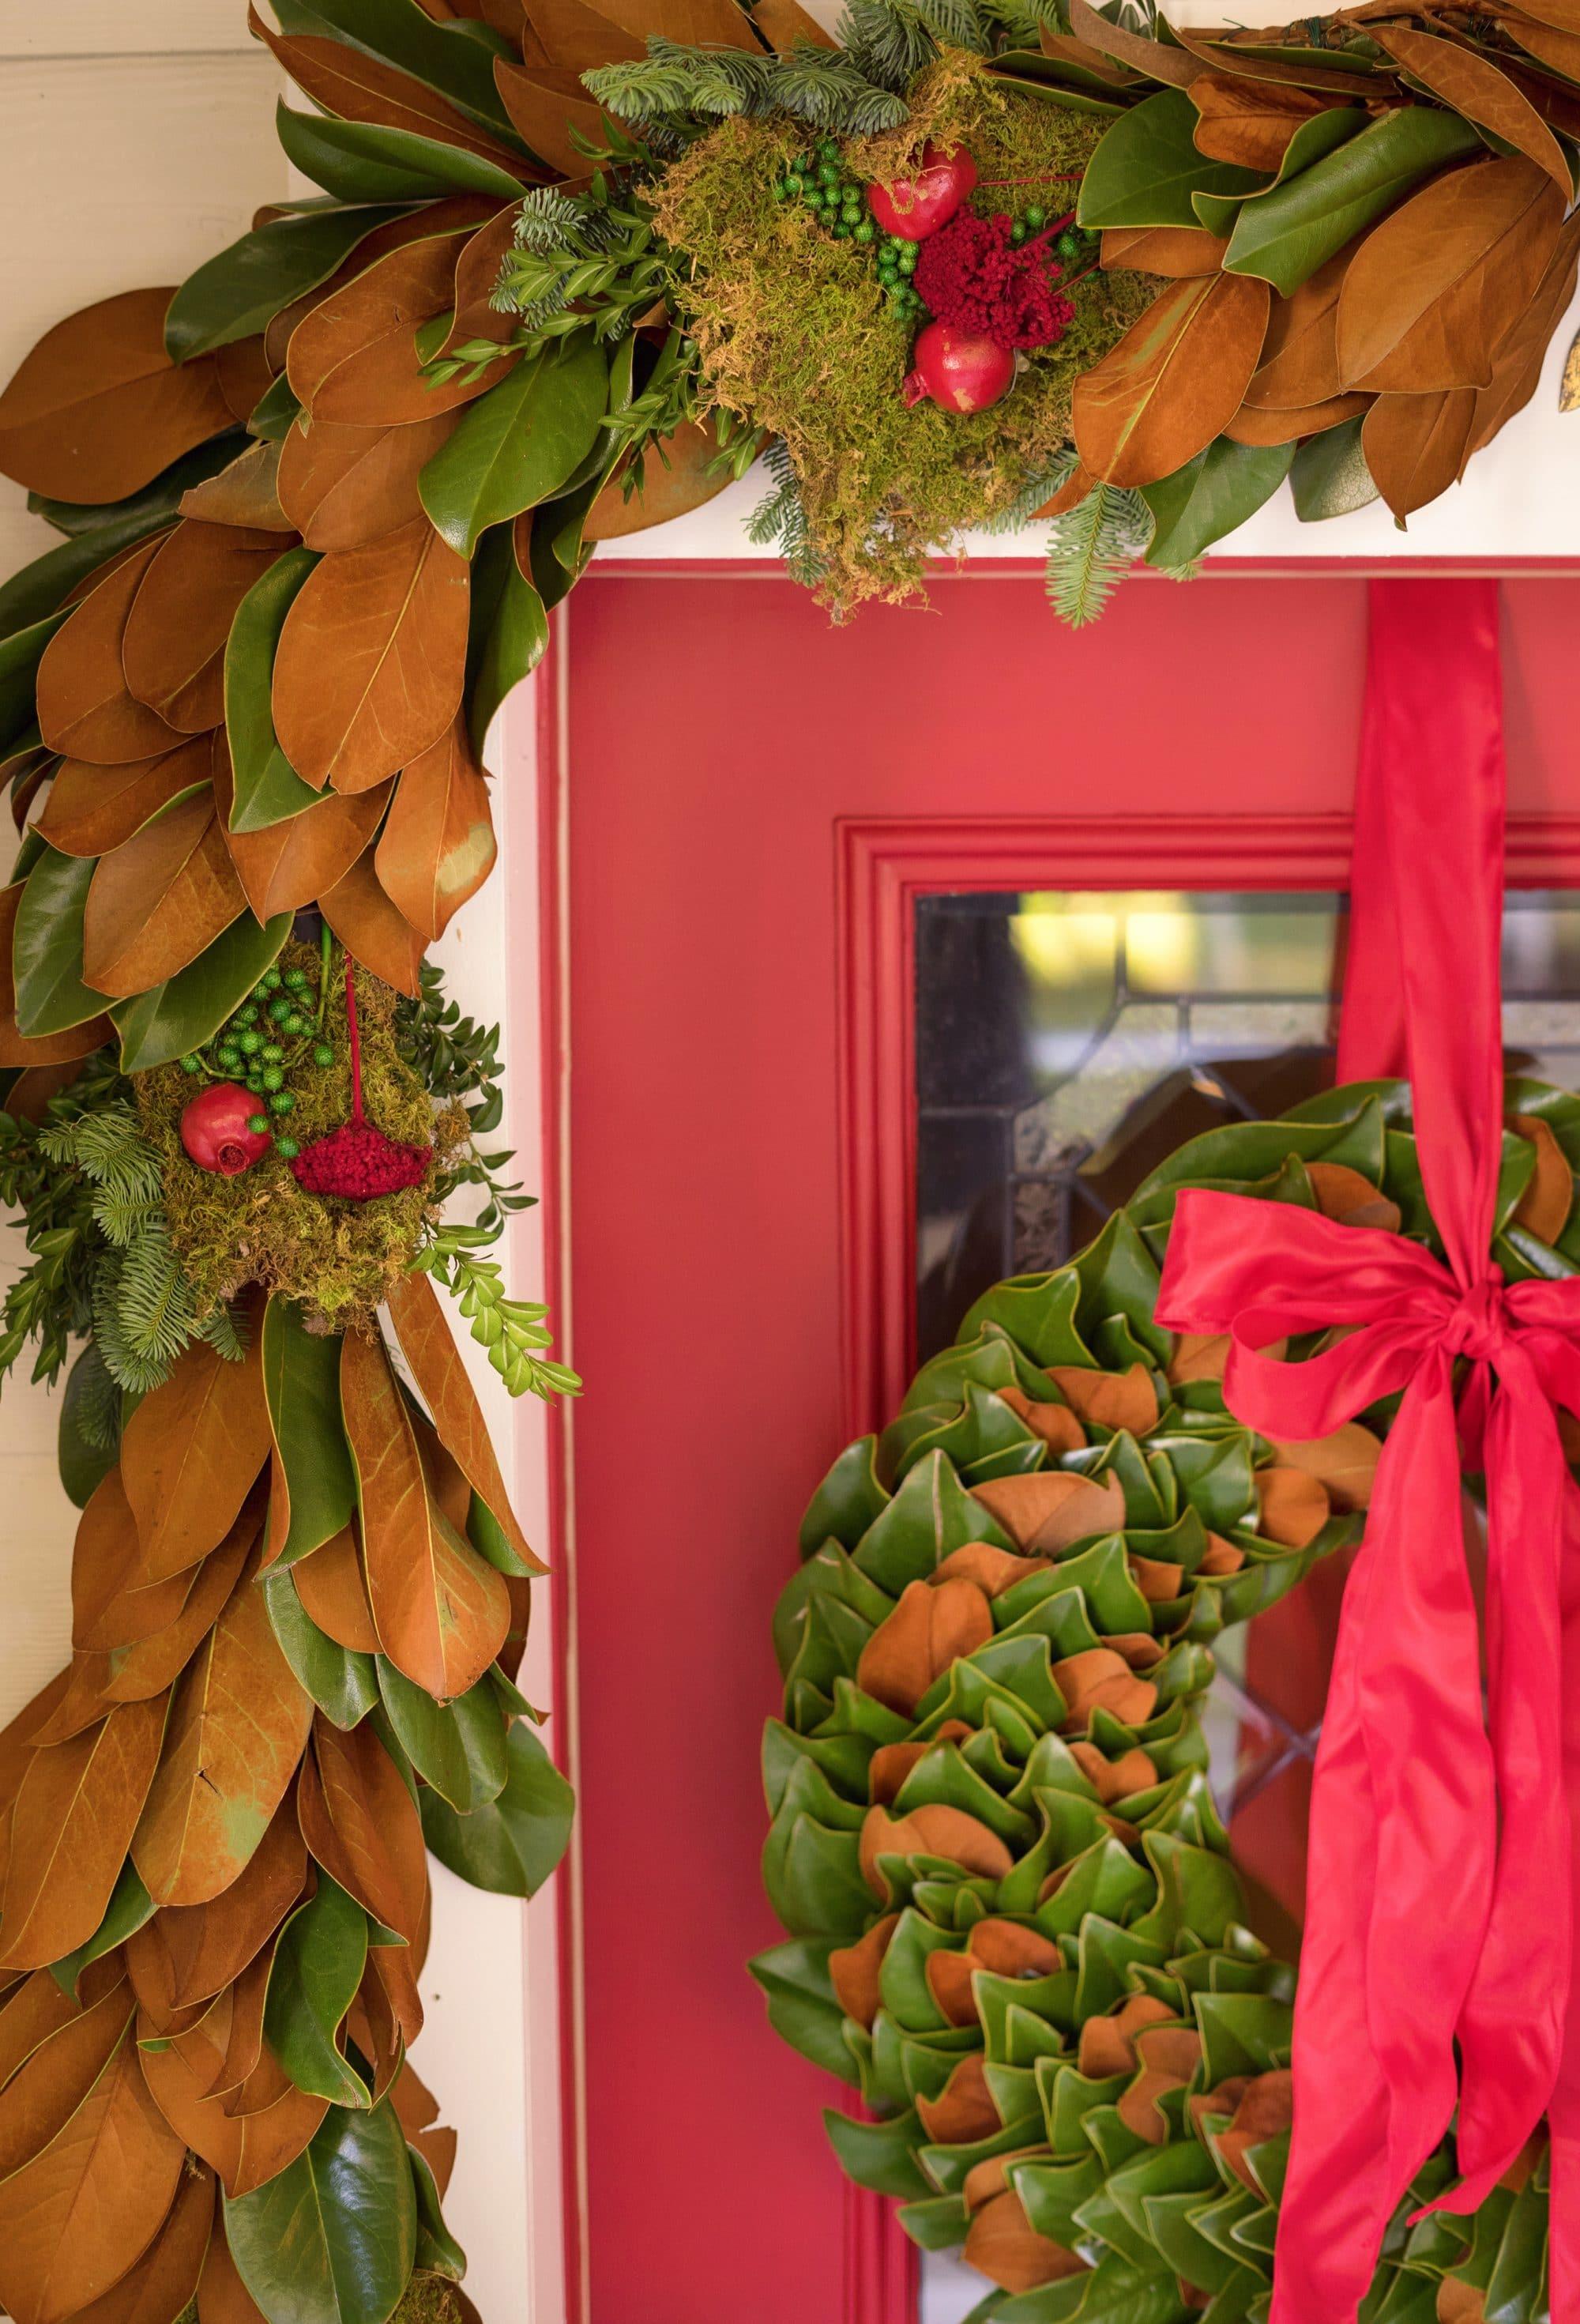 Blogger Ashley Brooke's 4 Steps to Fresh Front Door Holiday Decor | www.ashleybrookedesigns.com | Featuring: The Magnolia Company Holiday Decor